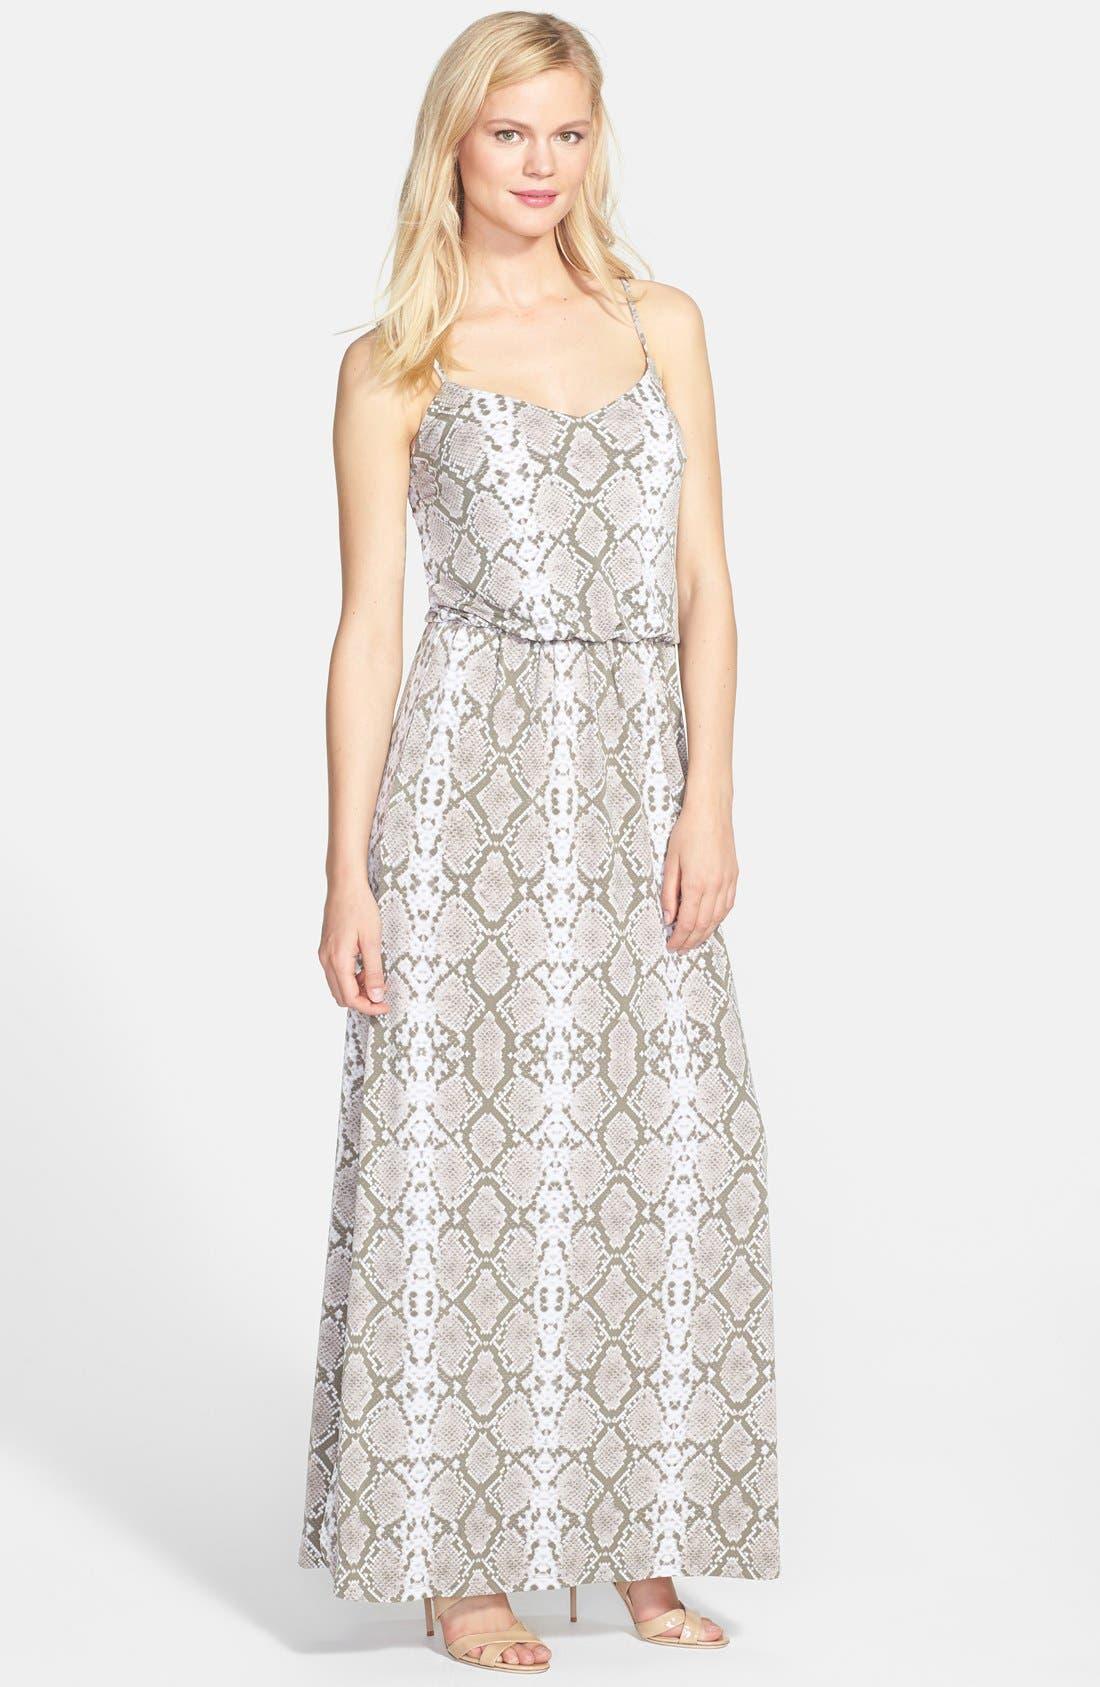 VINCE CAMUTO Snake Print Satin Maxi Dress, Main, color, 250